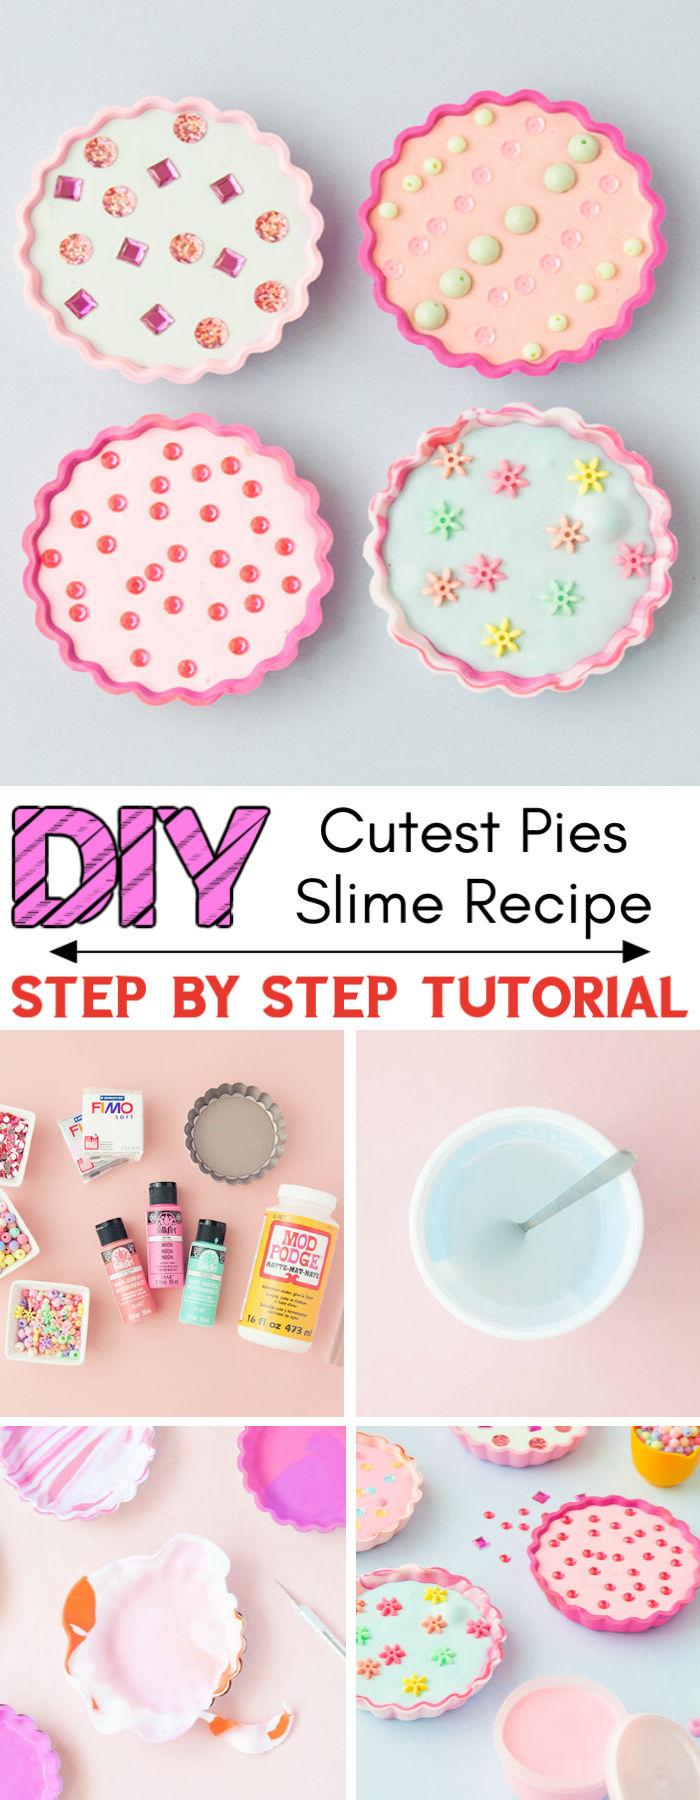 Mod Pod Slime Pies Recipe